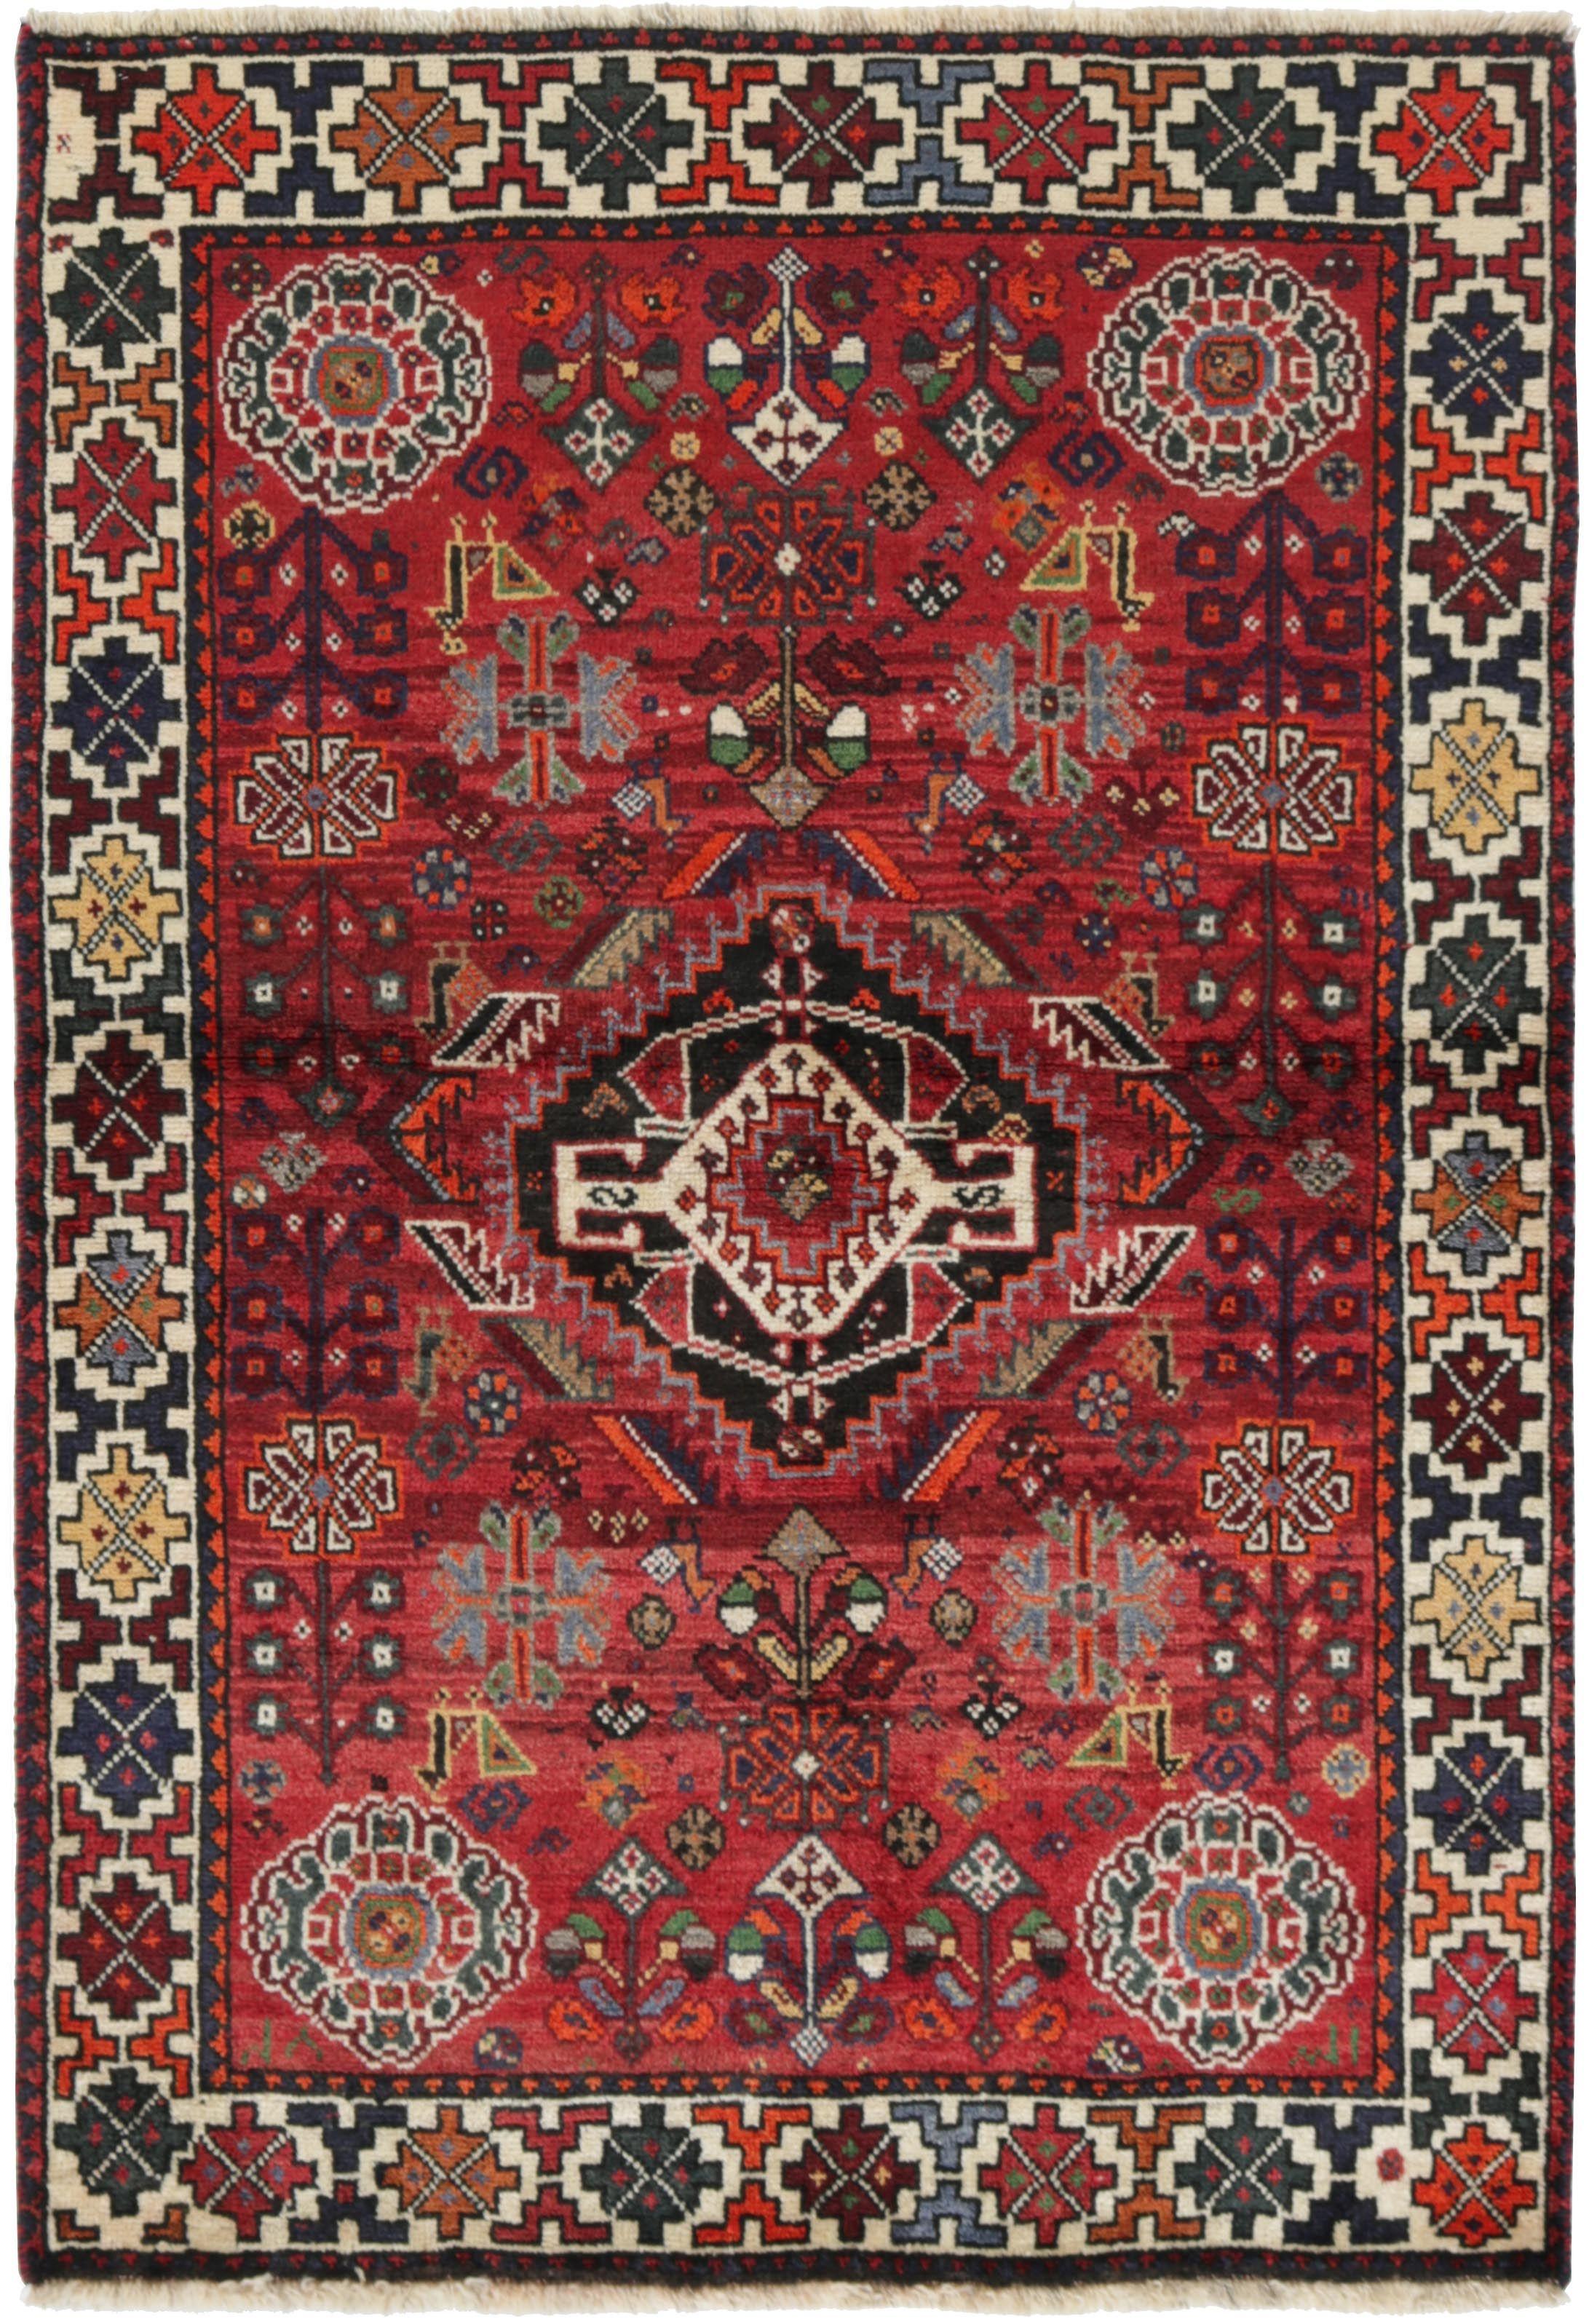 Kashghai Teppich 152x105 Tapis